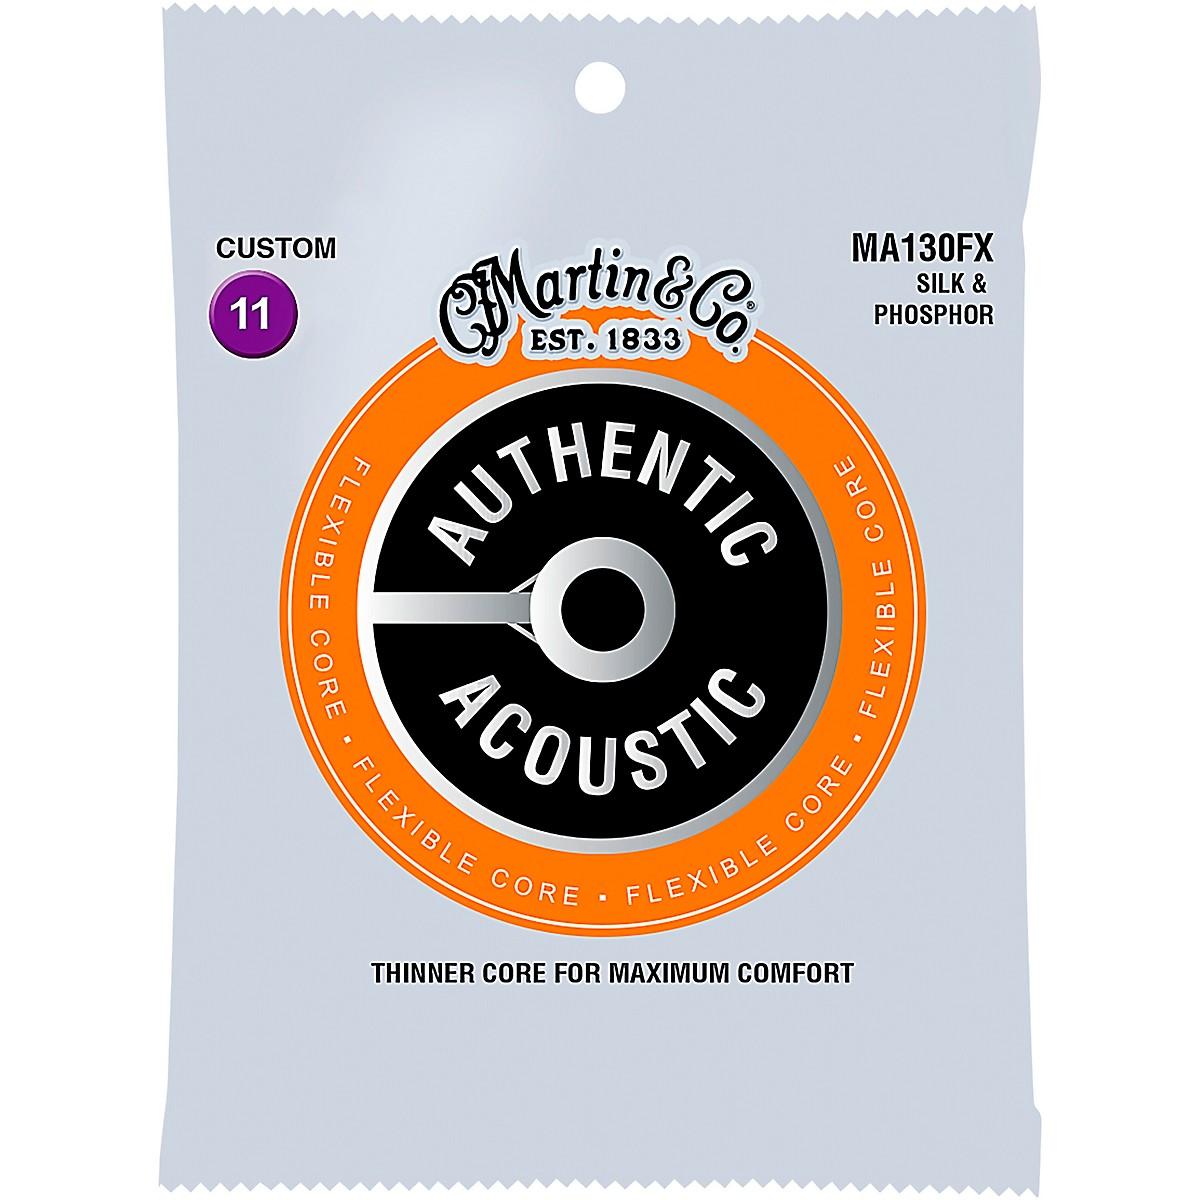 Martin MA130FX Authentic Acoustic - Flexible Core Silk and Phosphor Custom Guitar Strings